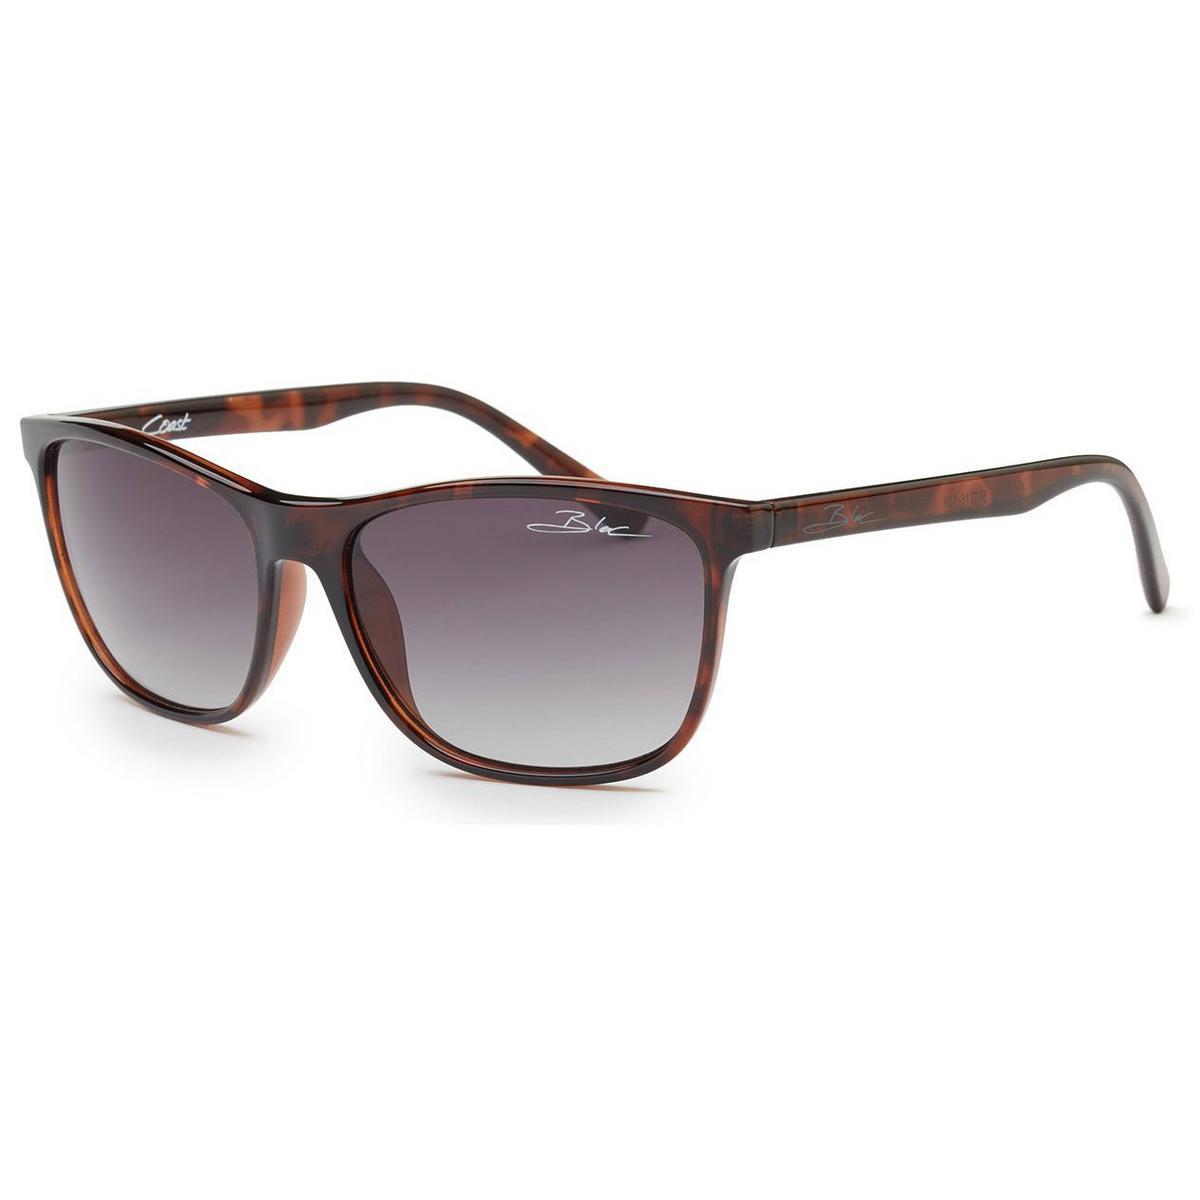 Bloc Coast Shiny Tortoise - Polarised Grey Lens Sunglasses